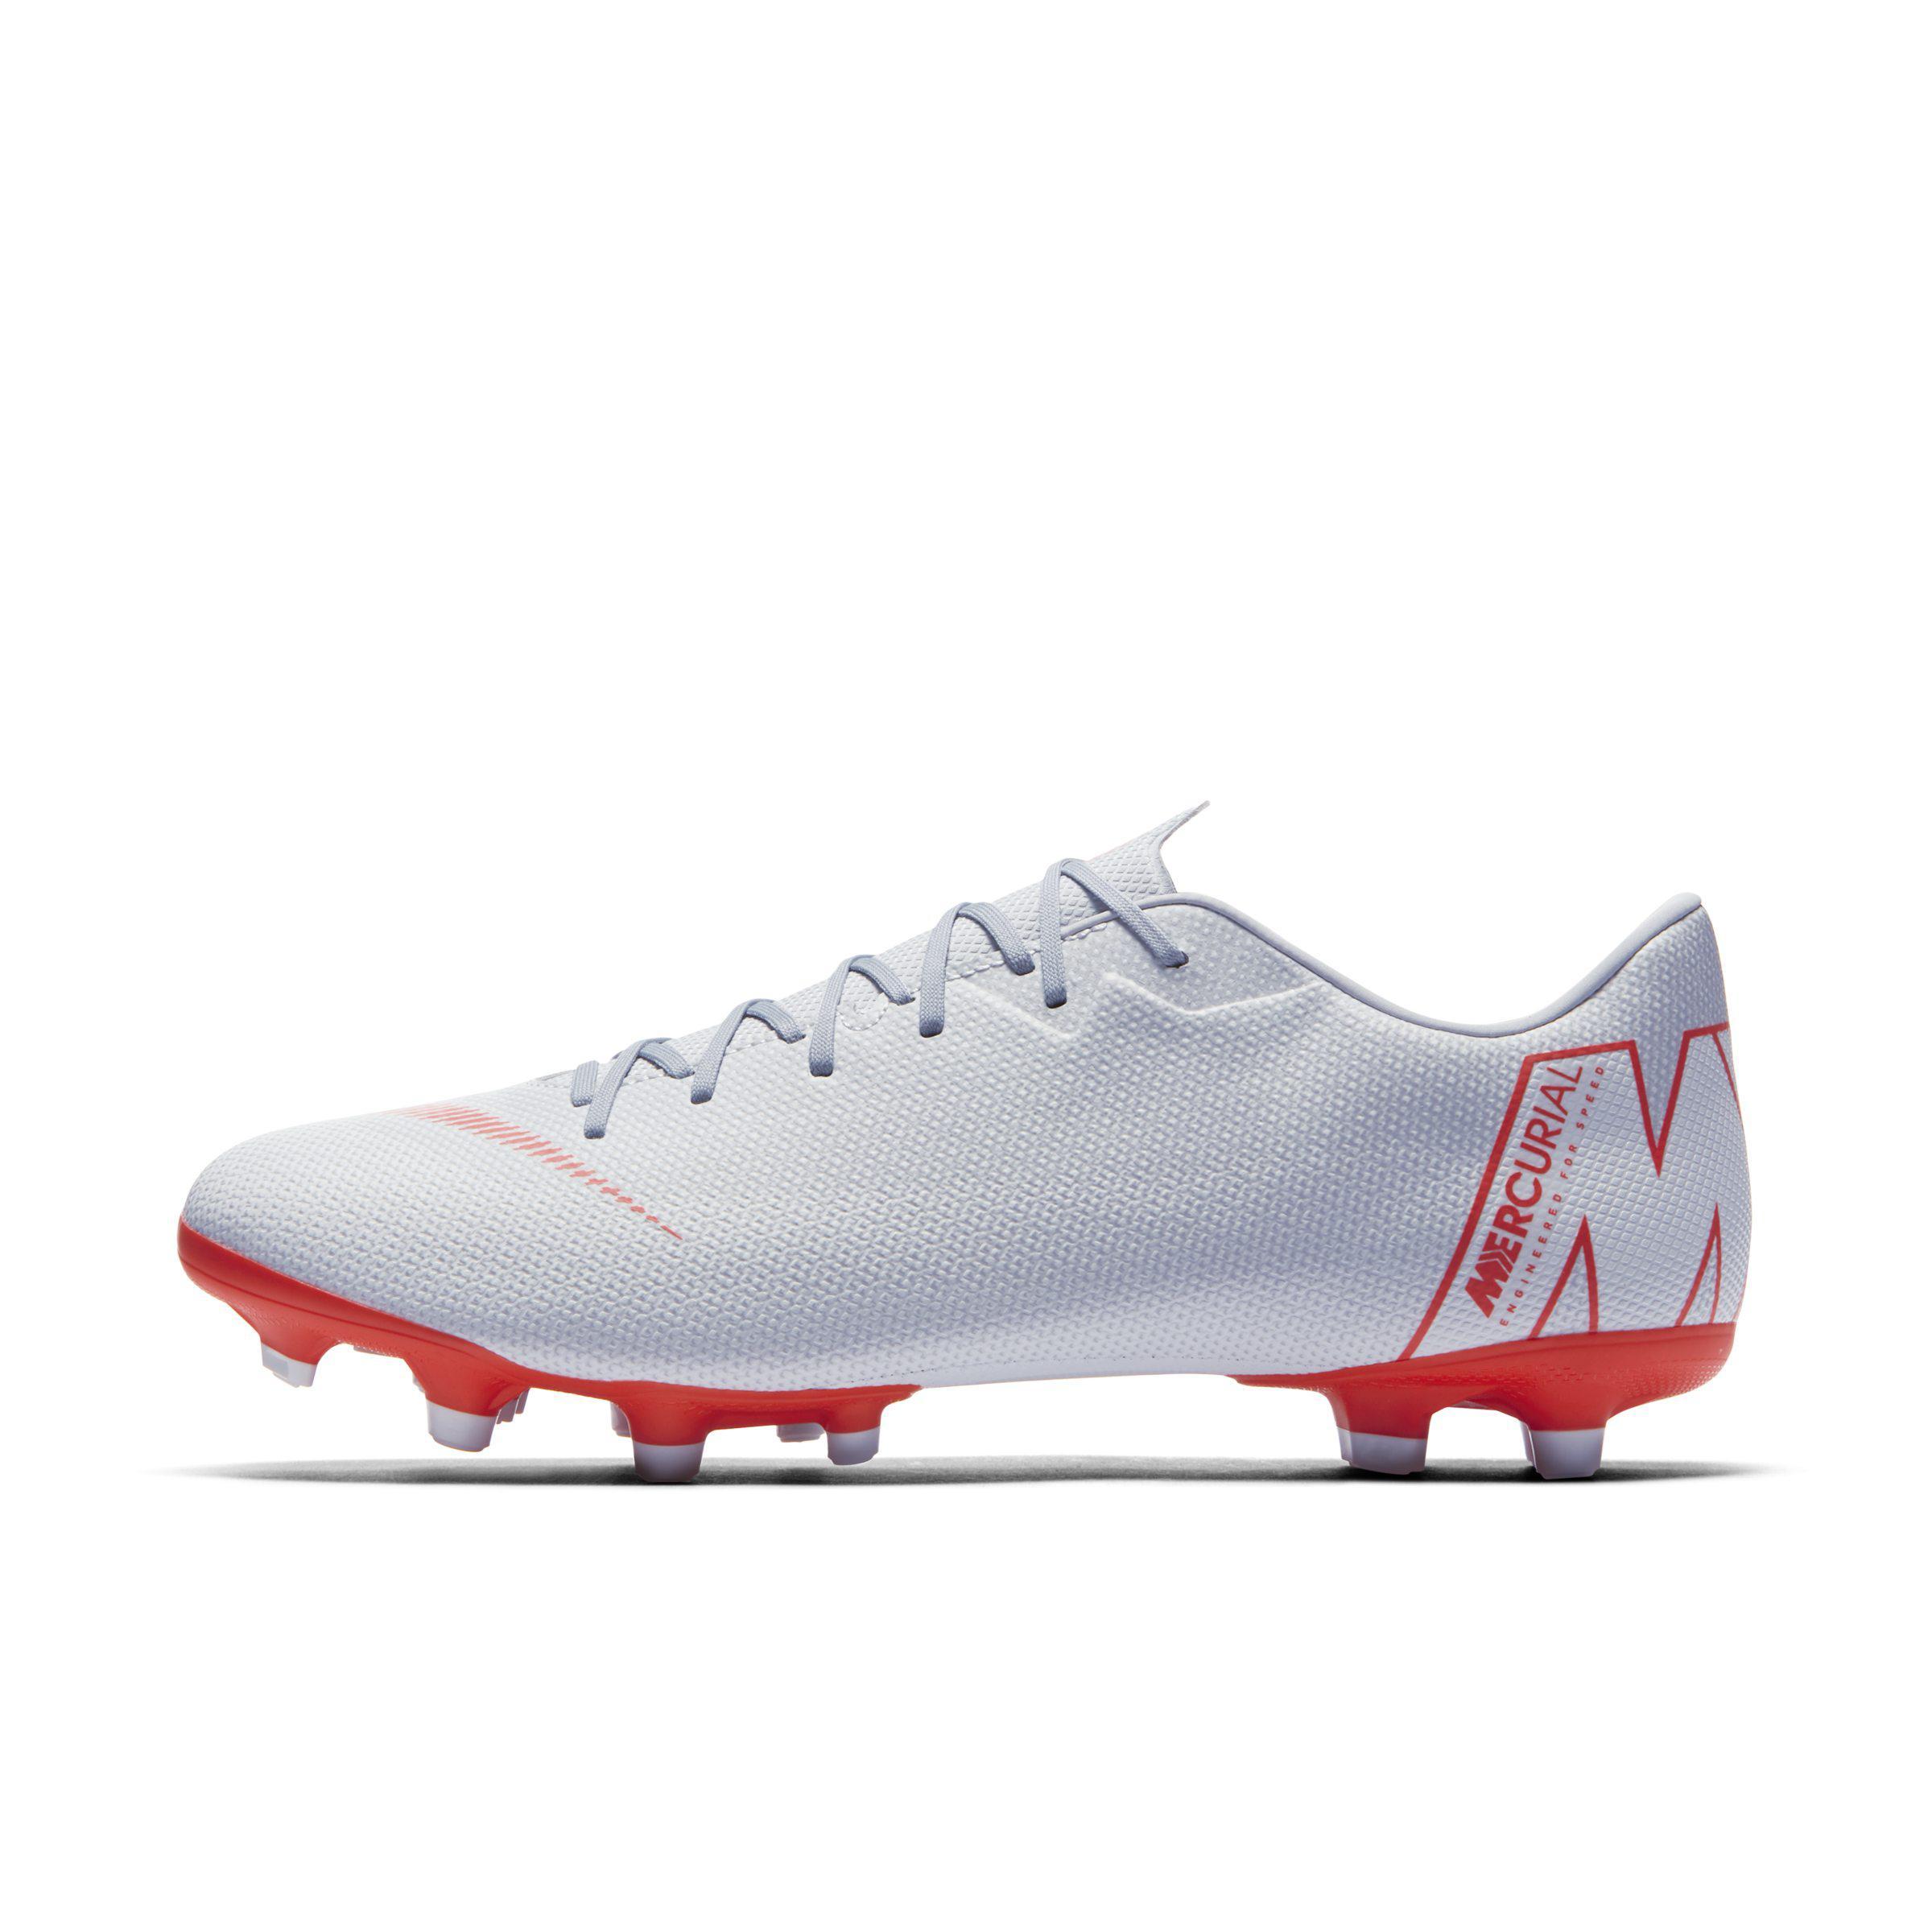 d2549d2e5 Nike Mercurial Vapor Xii Academy Multi-ground Football Boot in Gray ...